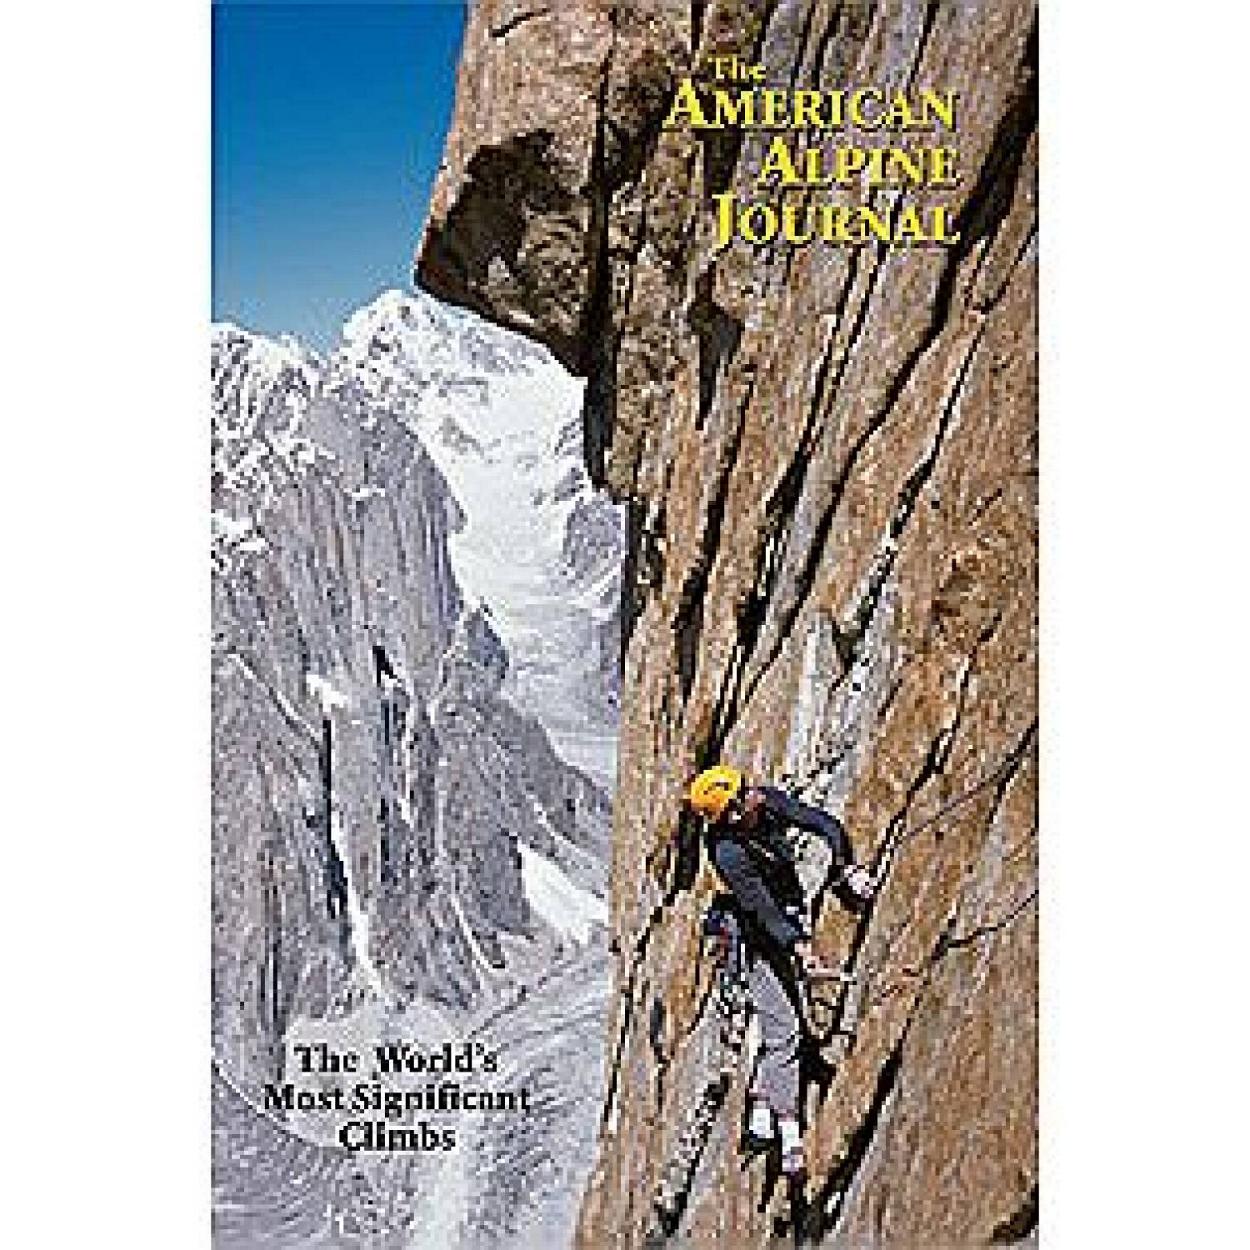 Image of American Alpine Journal 2005